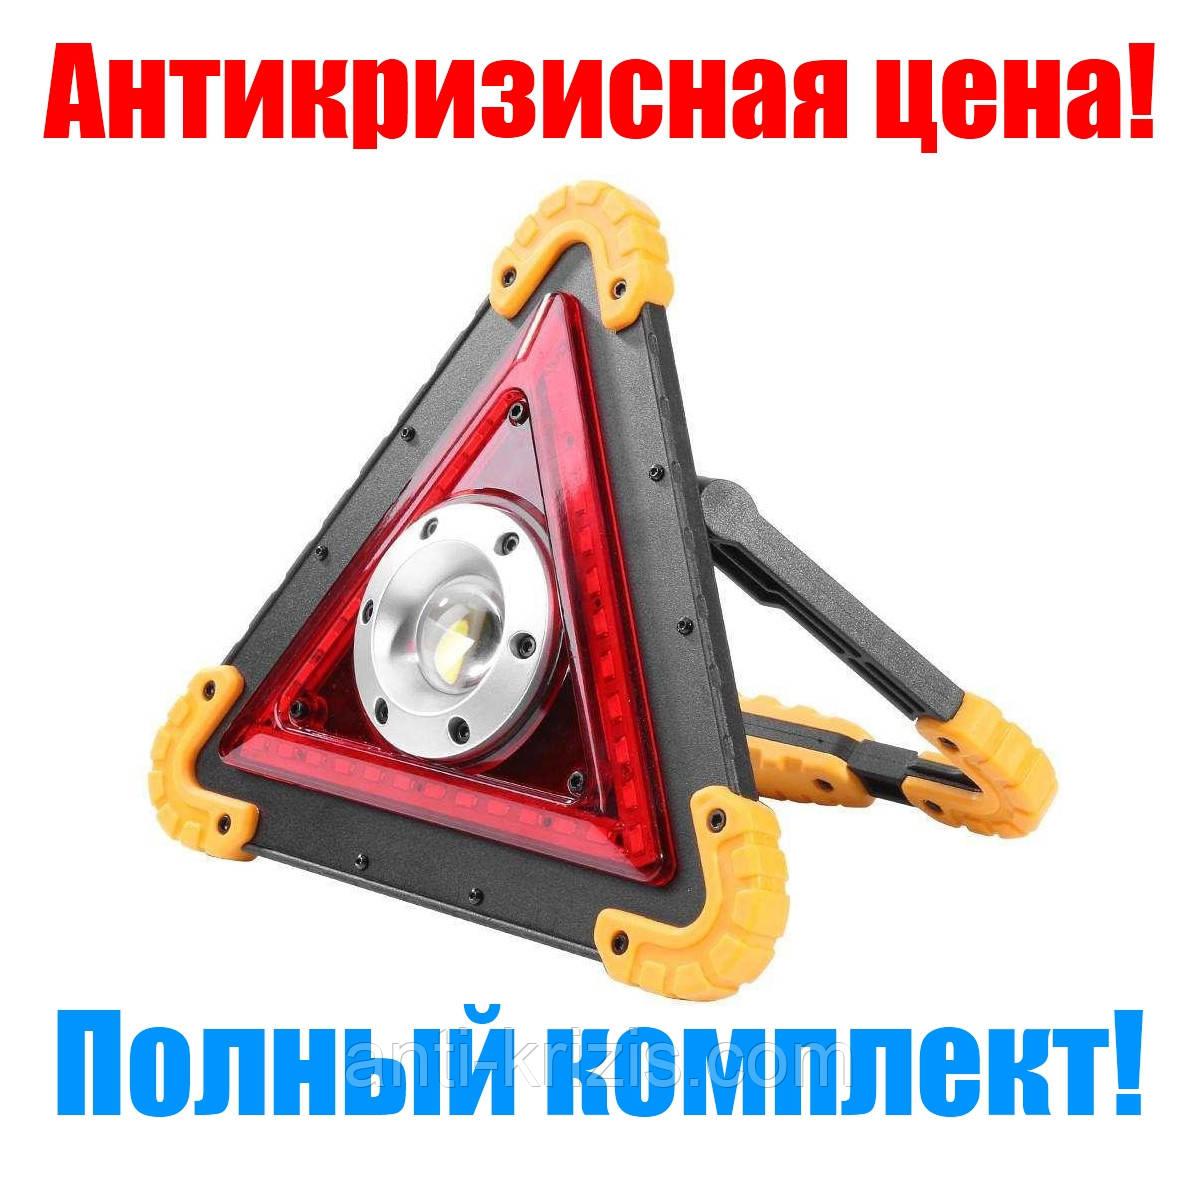 Прожектор светодиодный W837-COB+35SMD RED, 2x18650/4xAA, ЗУ microUSB+ Power Bank!